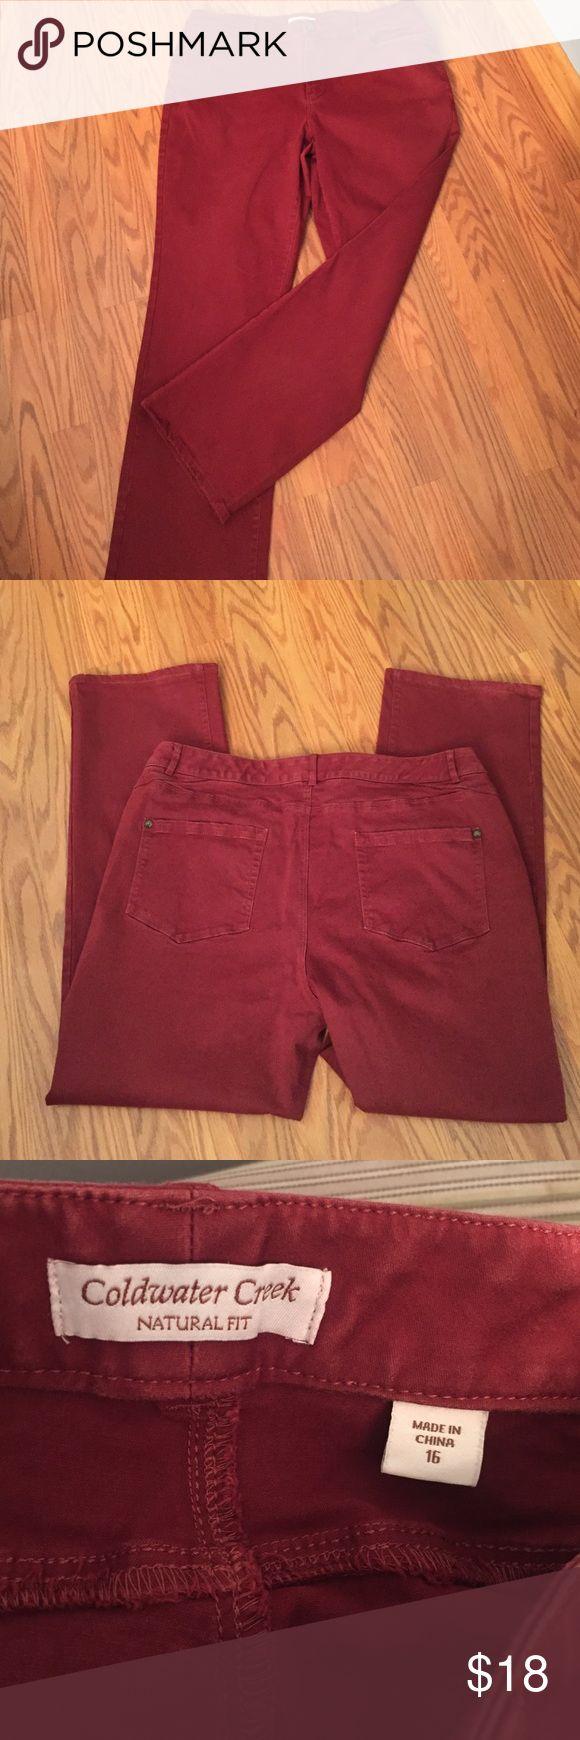 "Coldwater creek pants Coldwater creek natural fit rust color pants, inseam 28"", 80% cotton 17% rayon 3% spandex Coldwater Creek Pants Straight Leg"